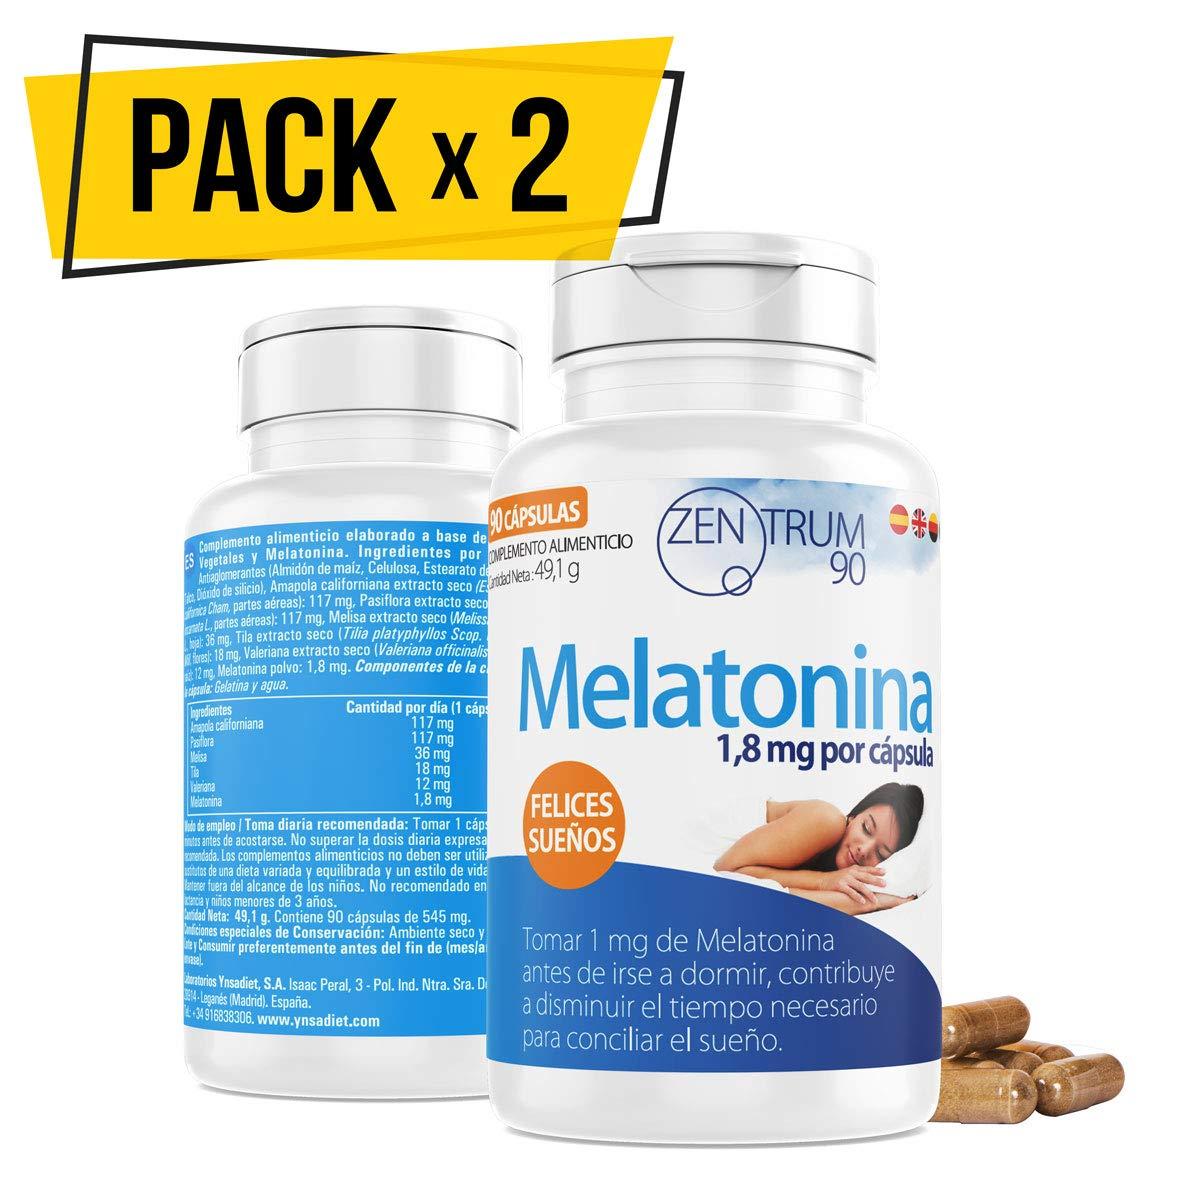 Melatonina ✔️ Valeriana ✔️ Tila ✔️ Pasiflora